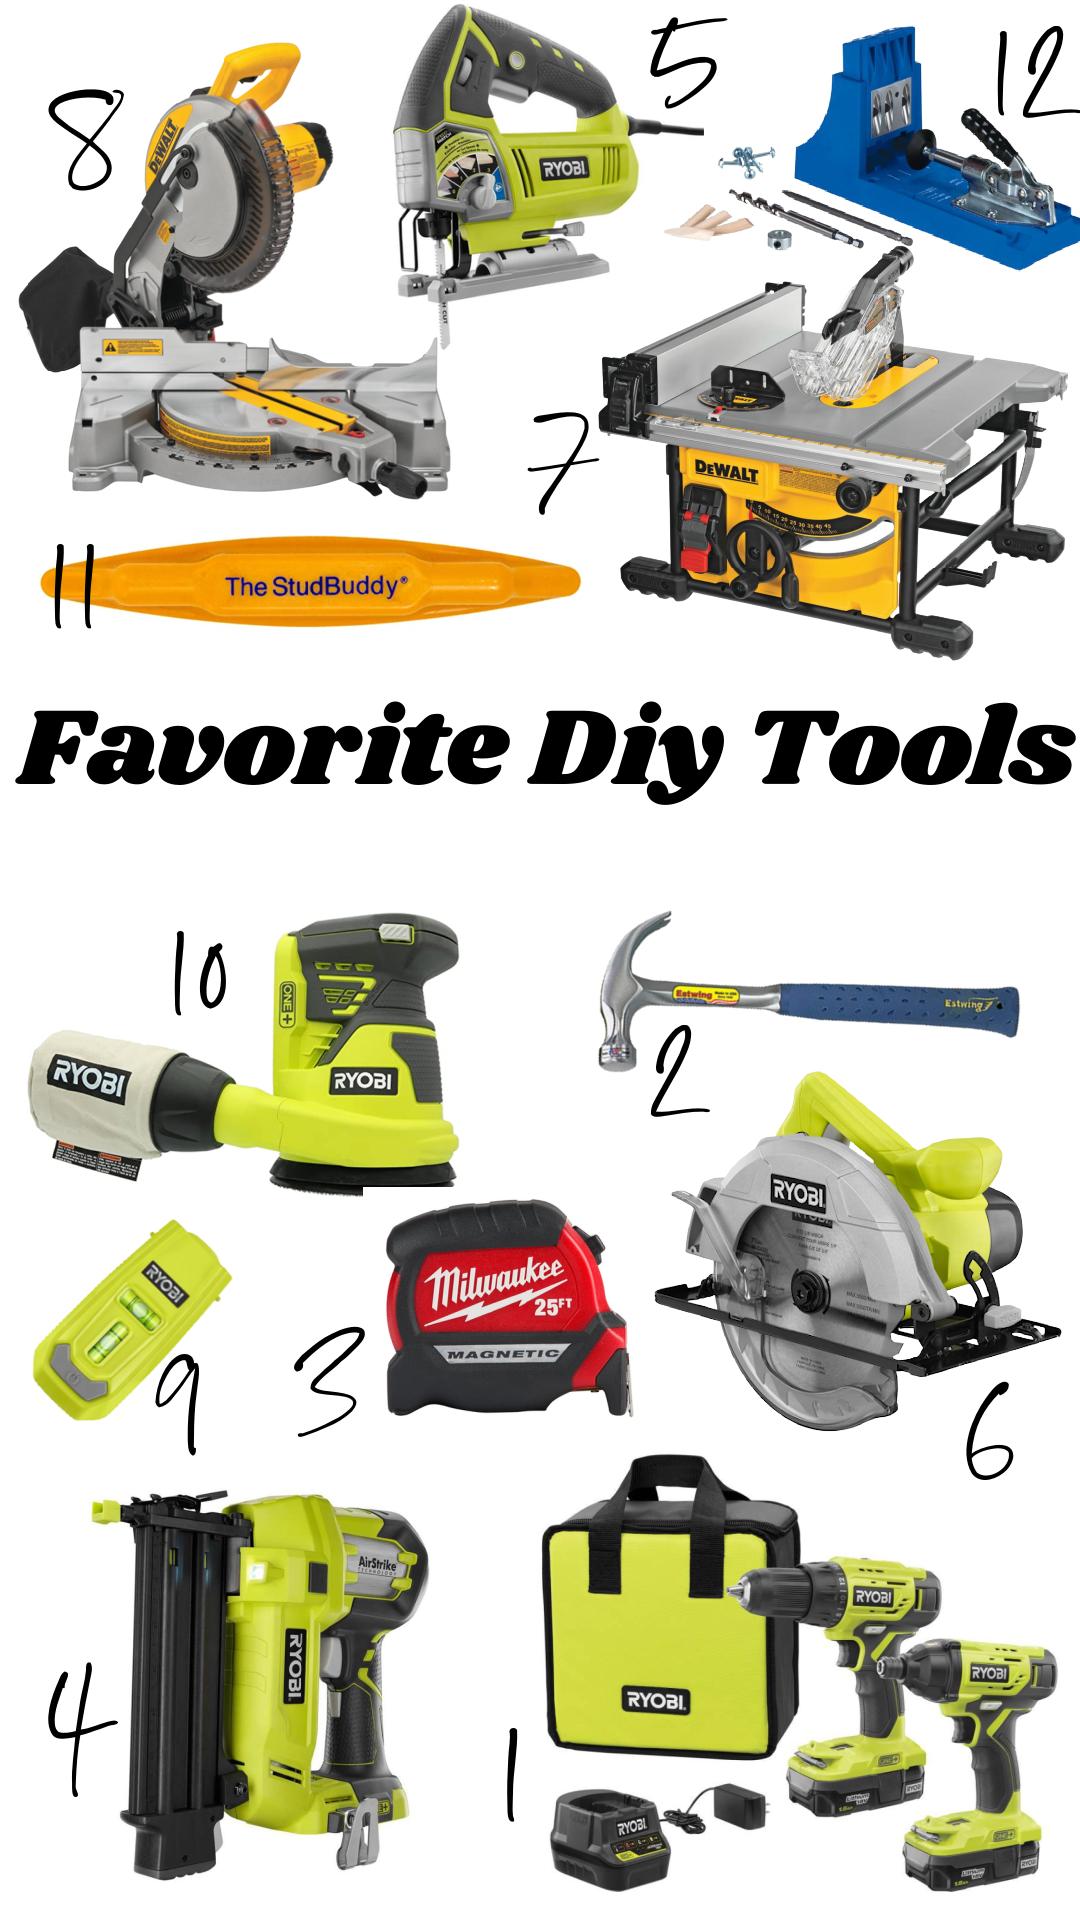 Favorite DIY Tools-  Must-have tools